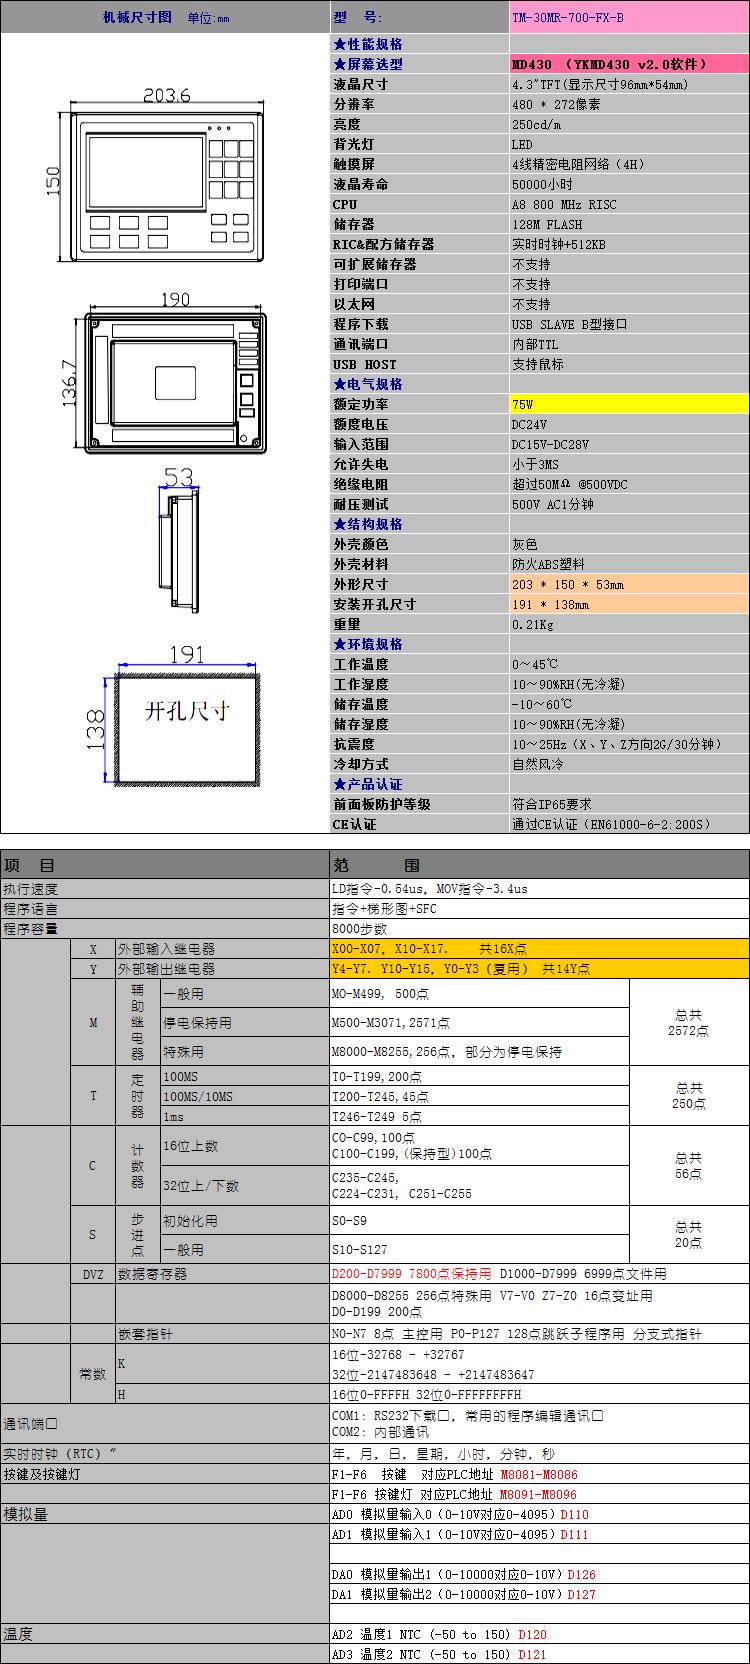 TM-30MR-700-FX-B详情.png